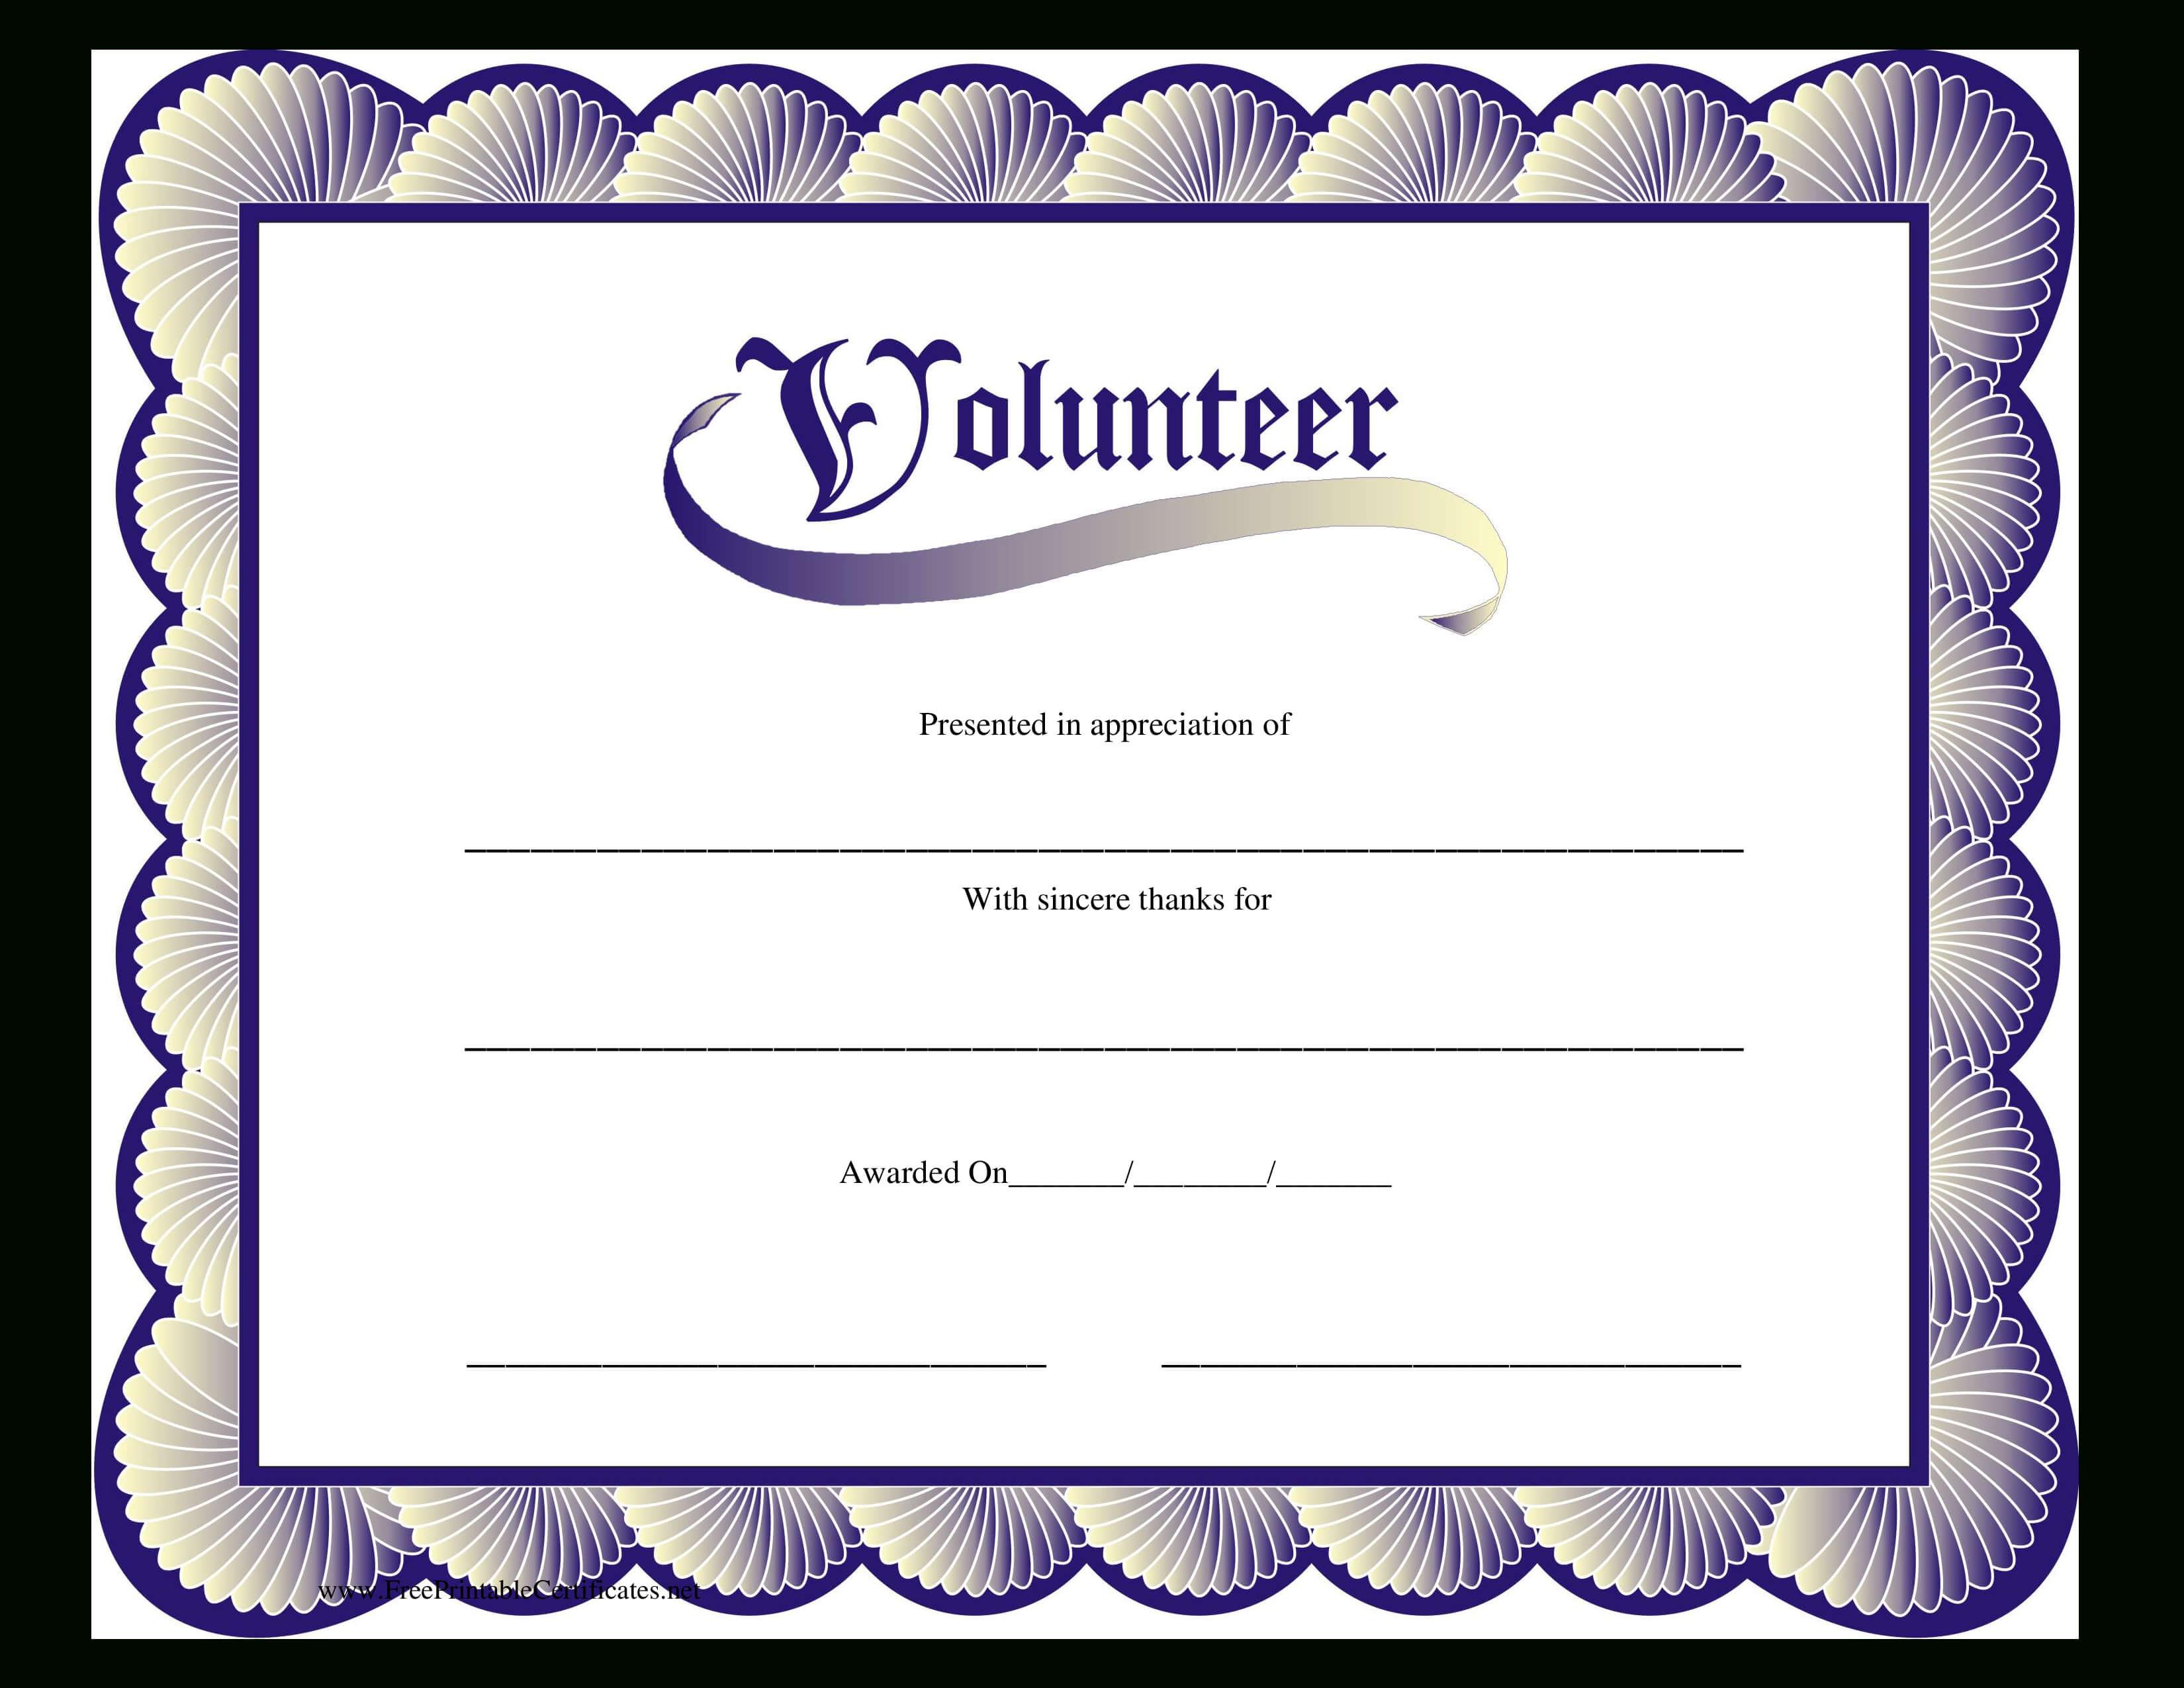 Volunteer Certificate | Templates At Allbusinesstemplates with Volunteer Certificate Template